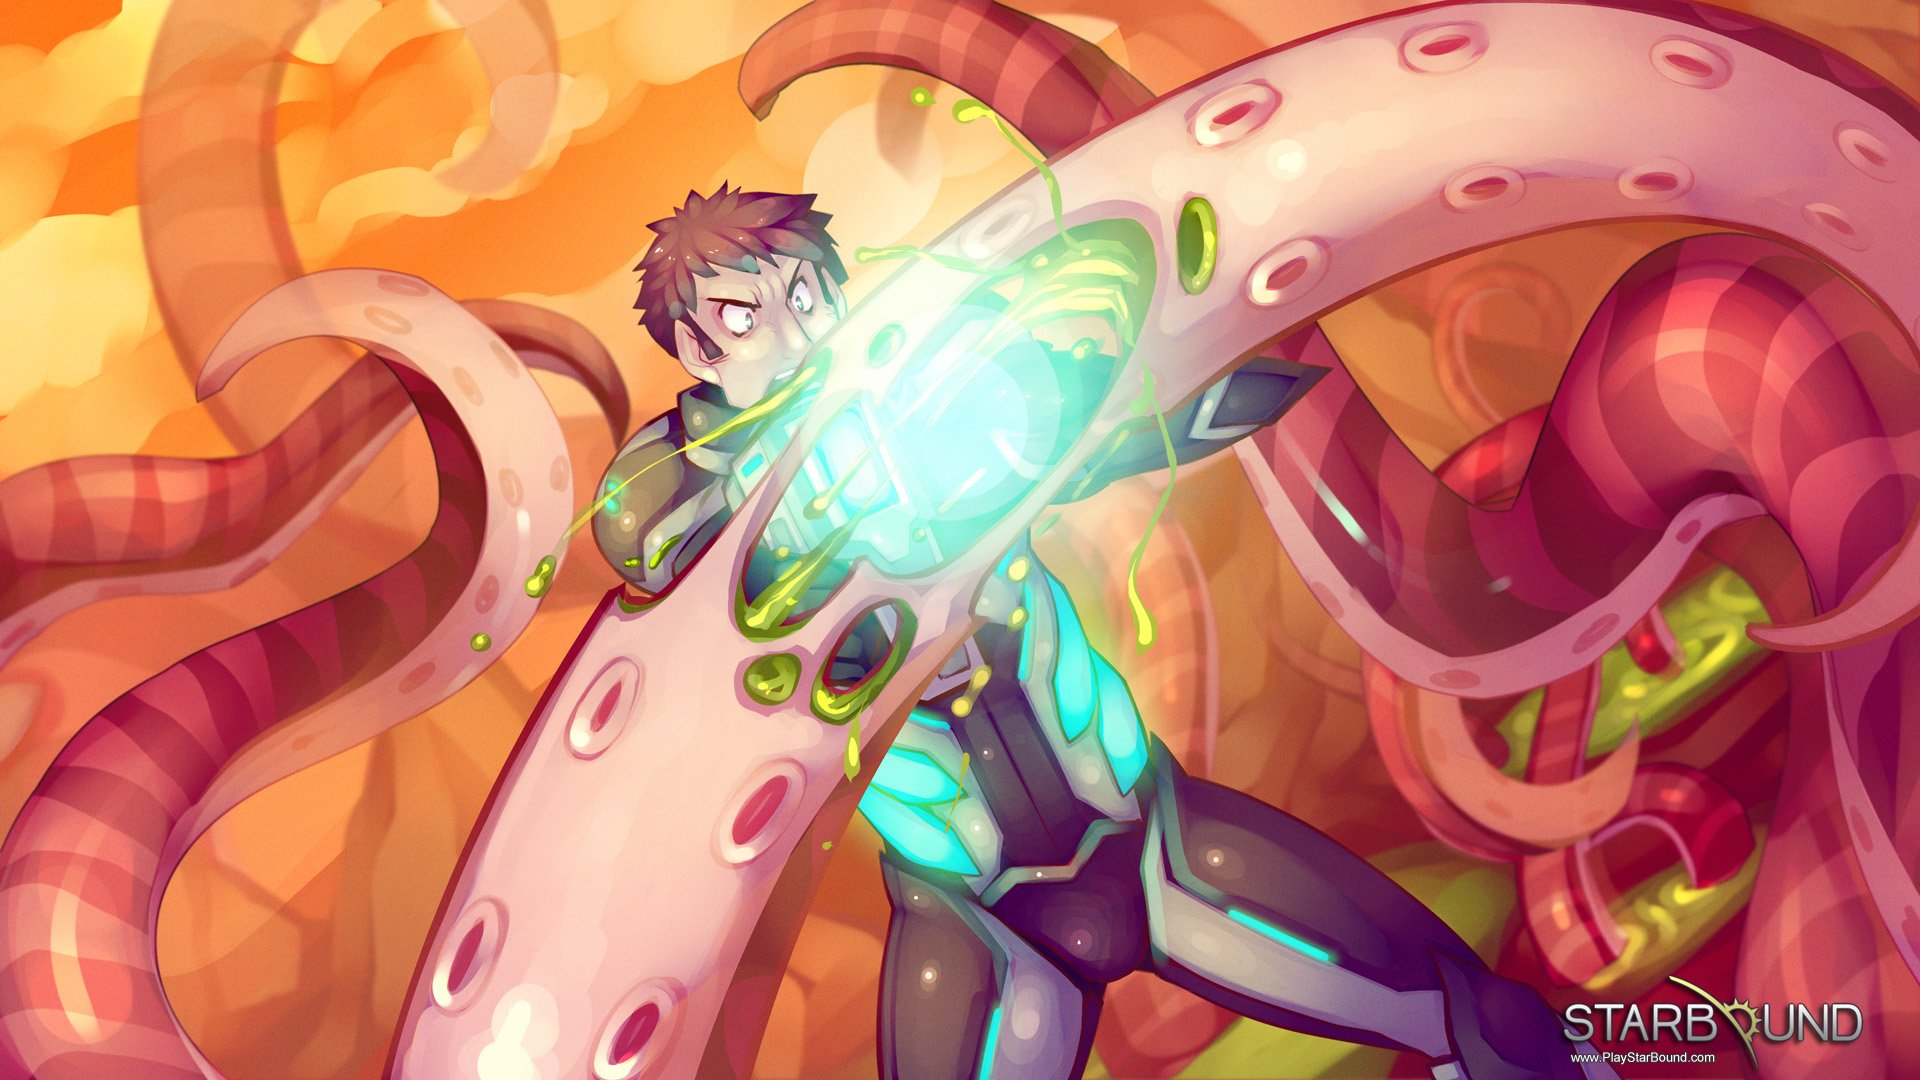 Starbound - скриншоты и фото игры Starbound, графика игры. Канобу